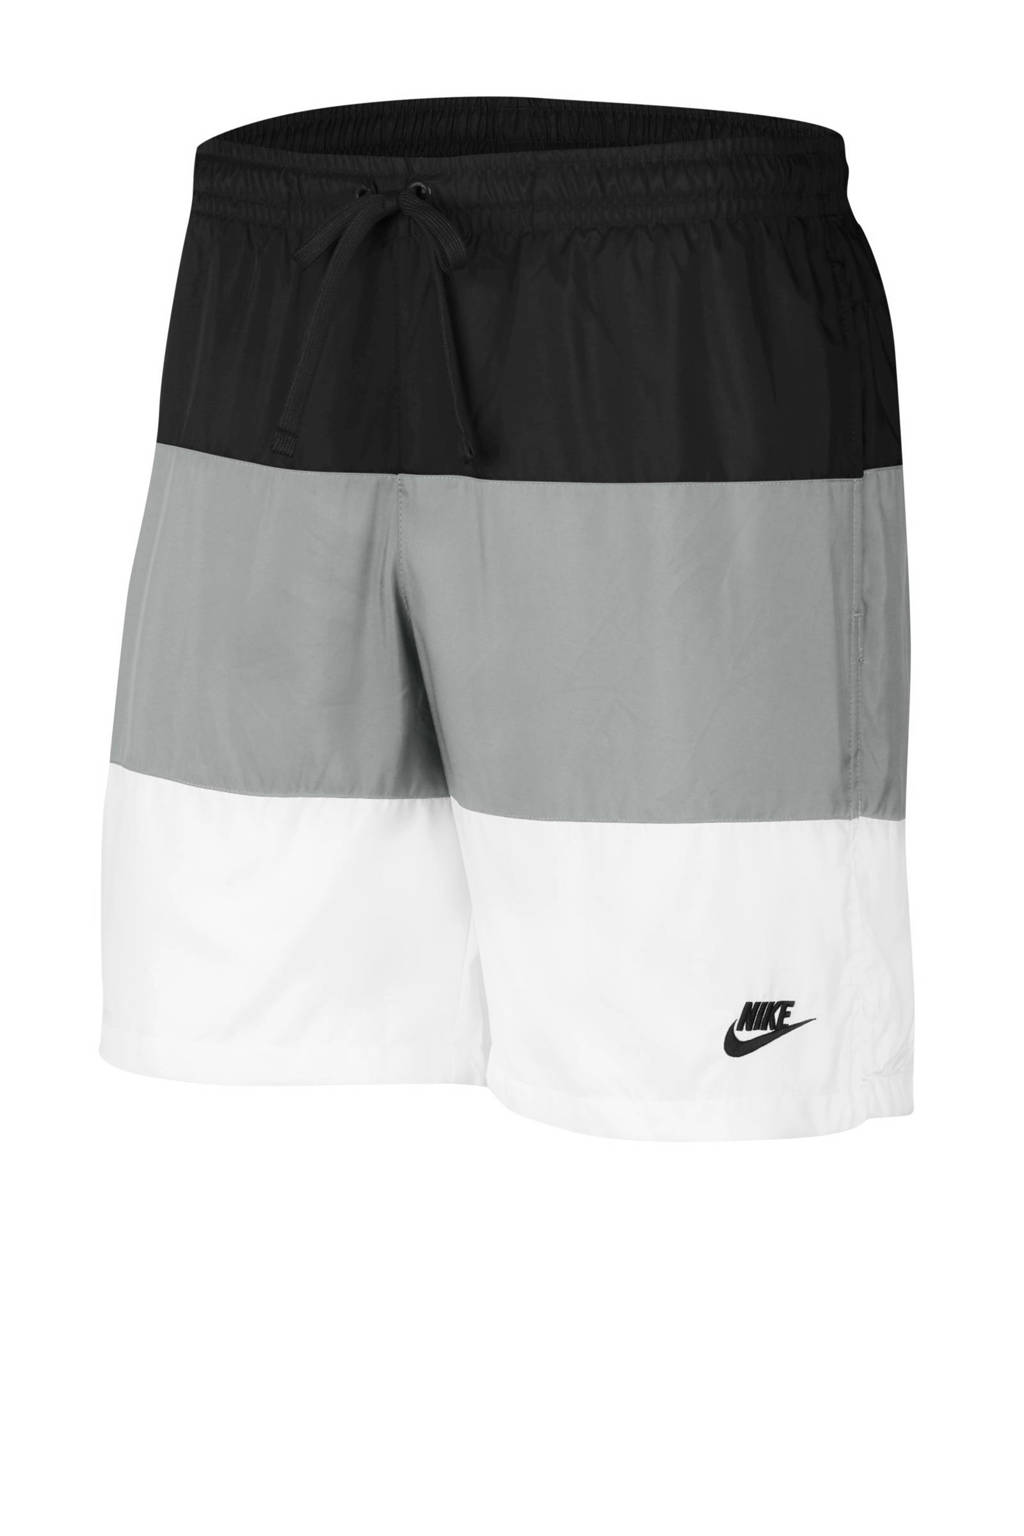 Nike short zwart/grijs/wit, Zwart/grijs/wit